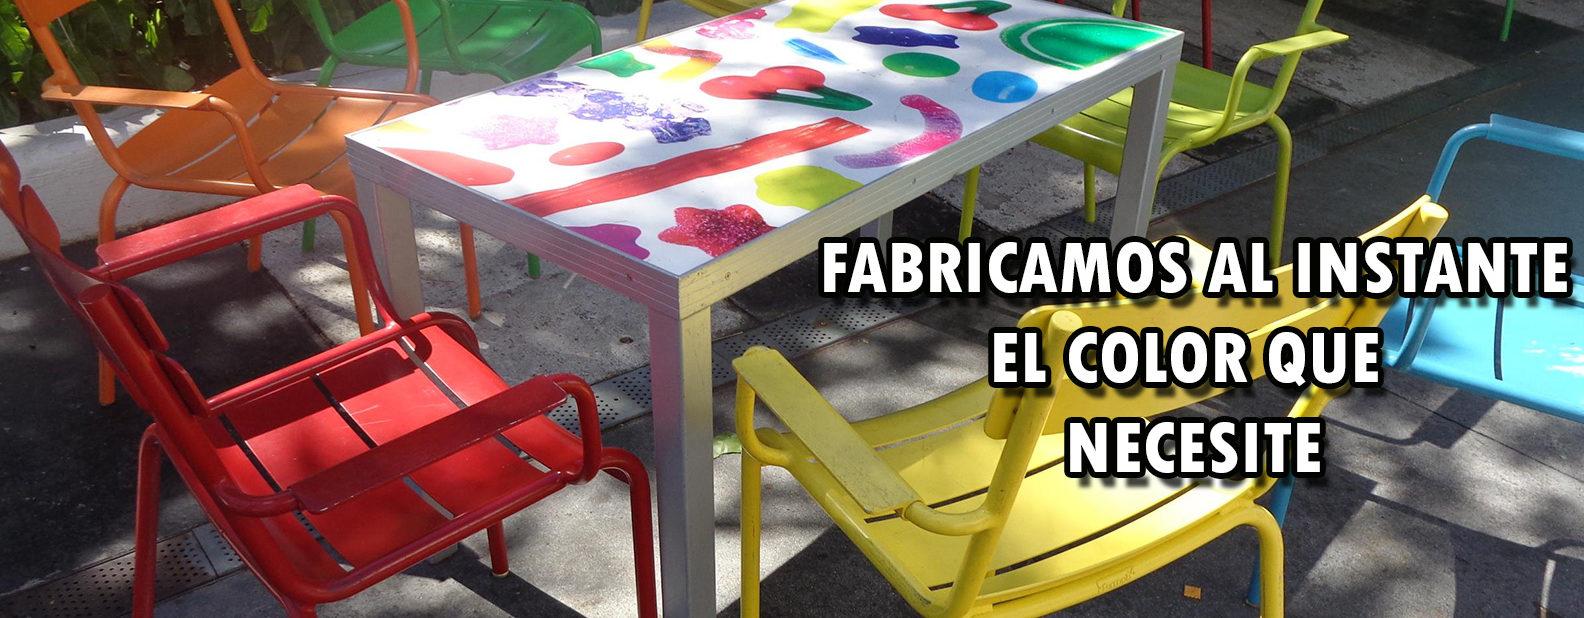 Fabricamos_colores